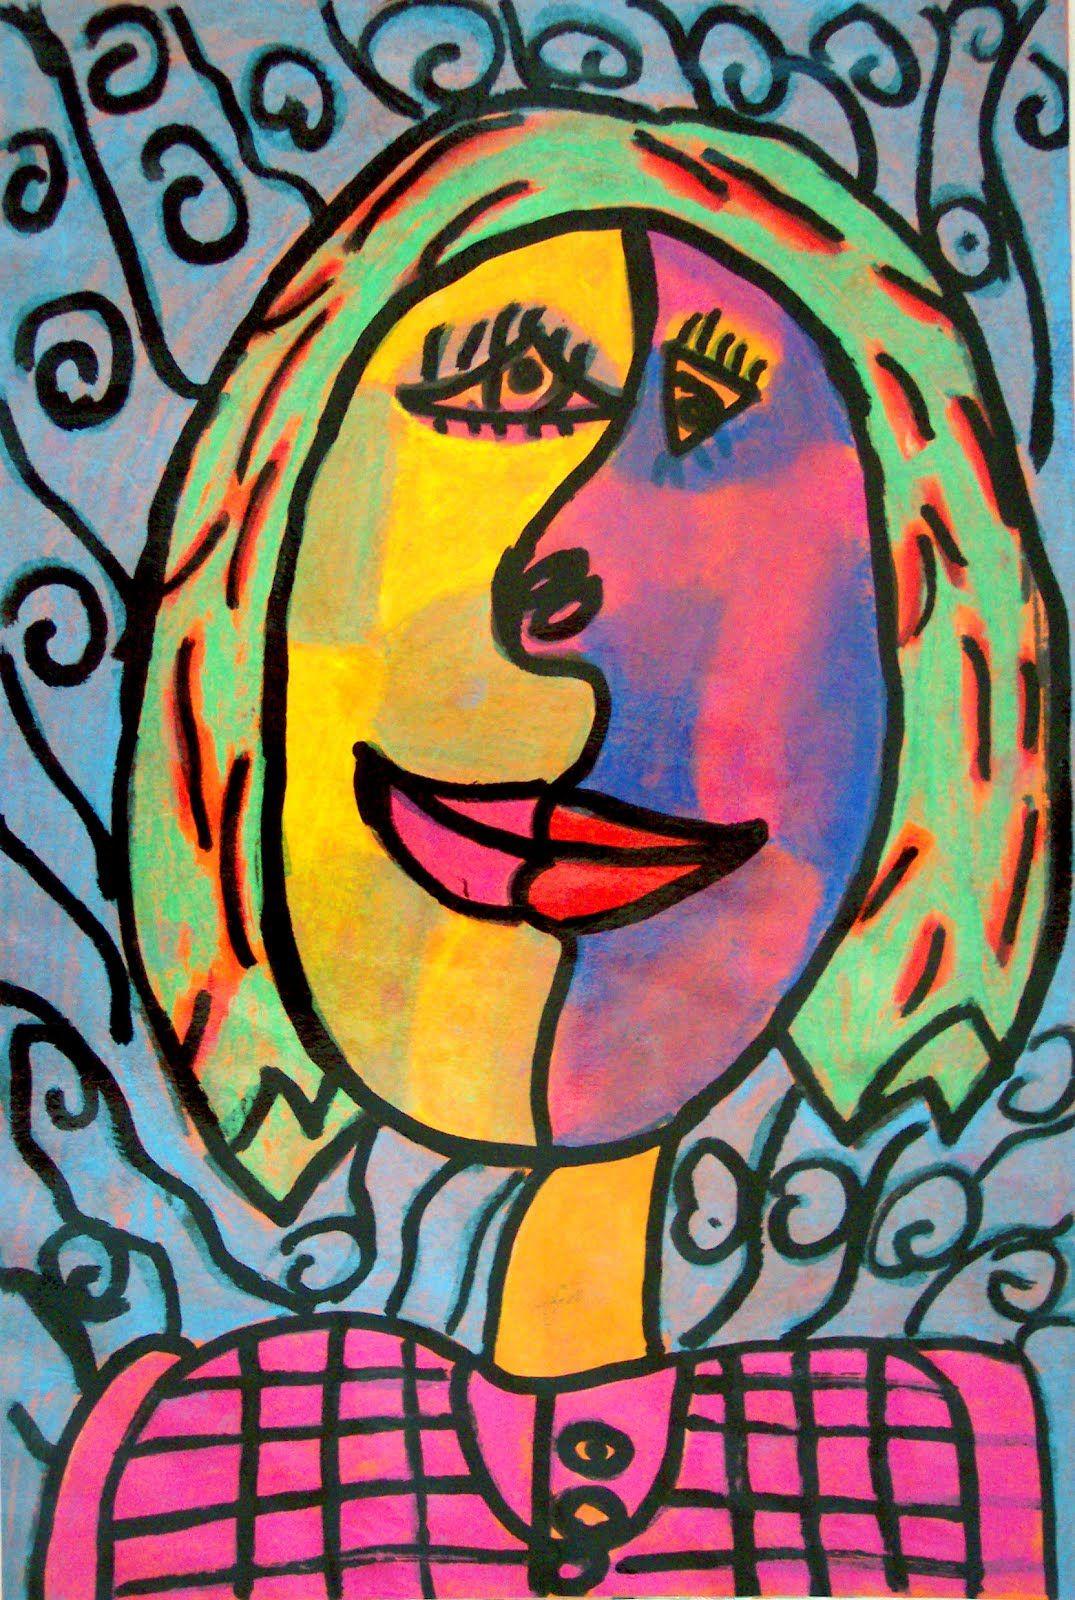 Pablo Picasso Self Portraits